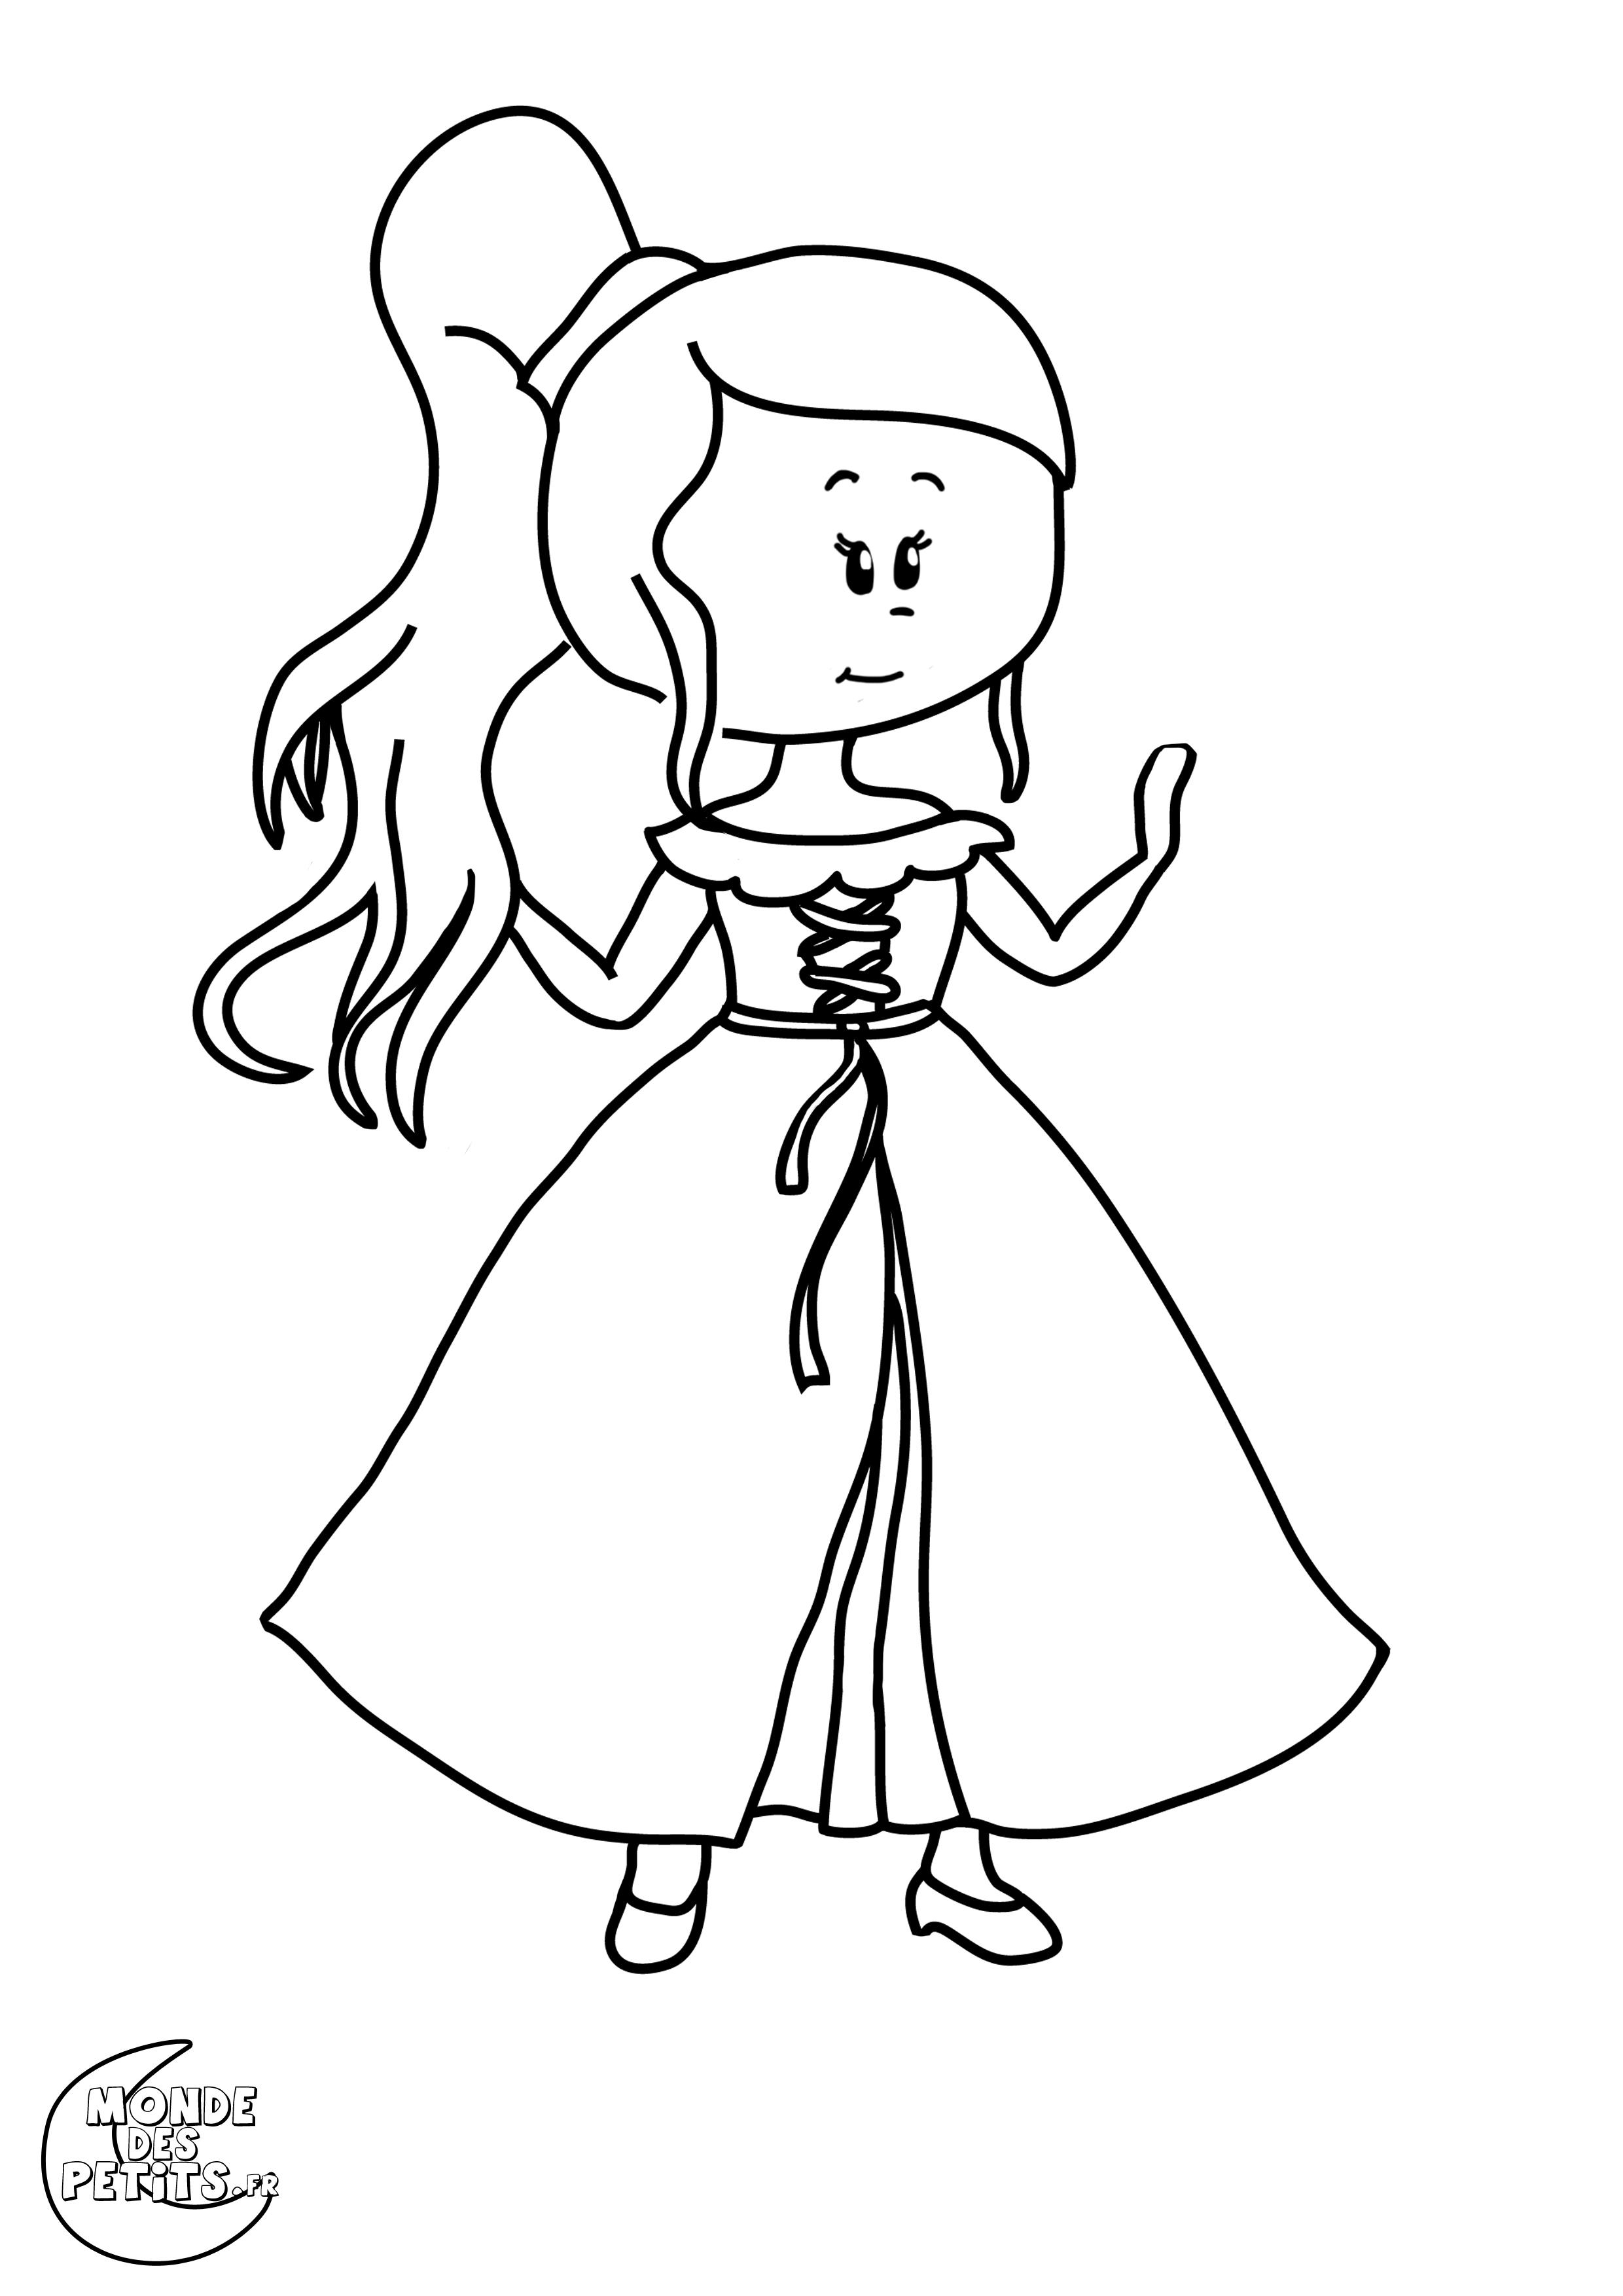 Impressionnant Dessin Coloriage Princesse En Ligne